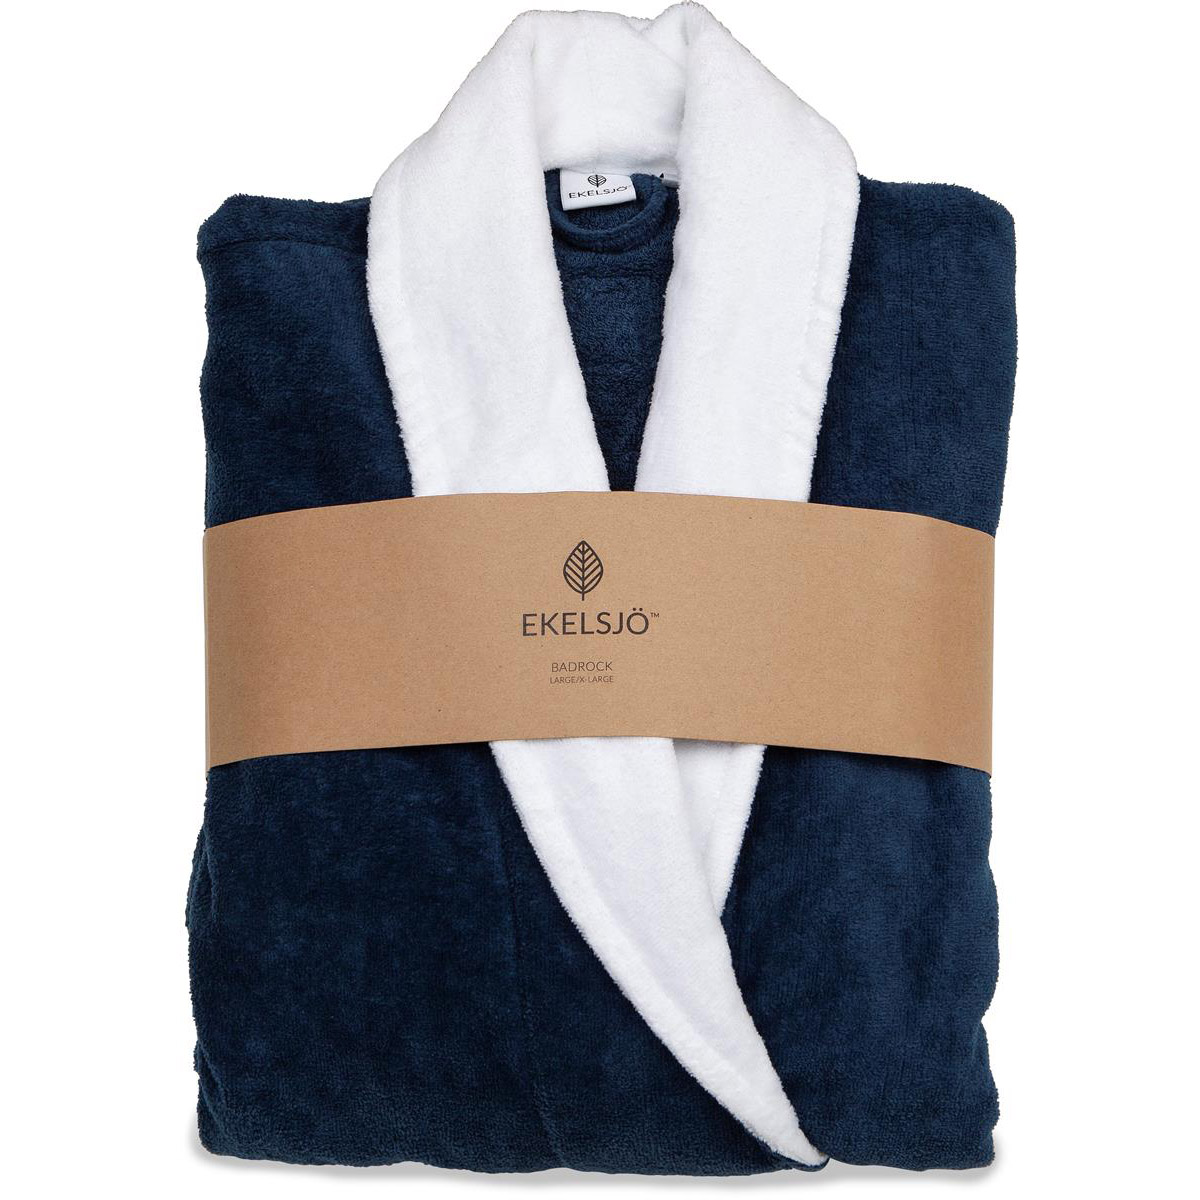 Ekelsjö badrock blå med vitt slag L/XL pack